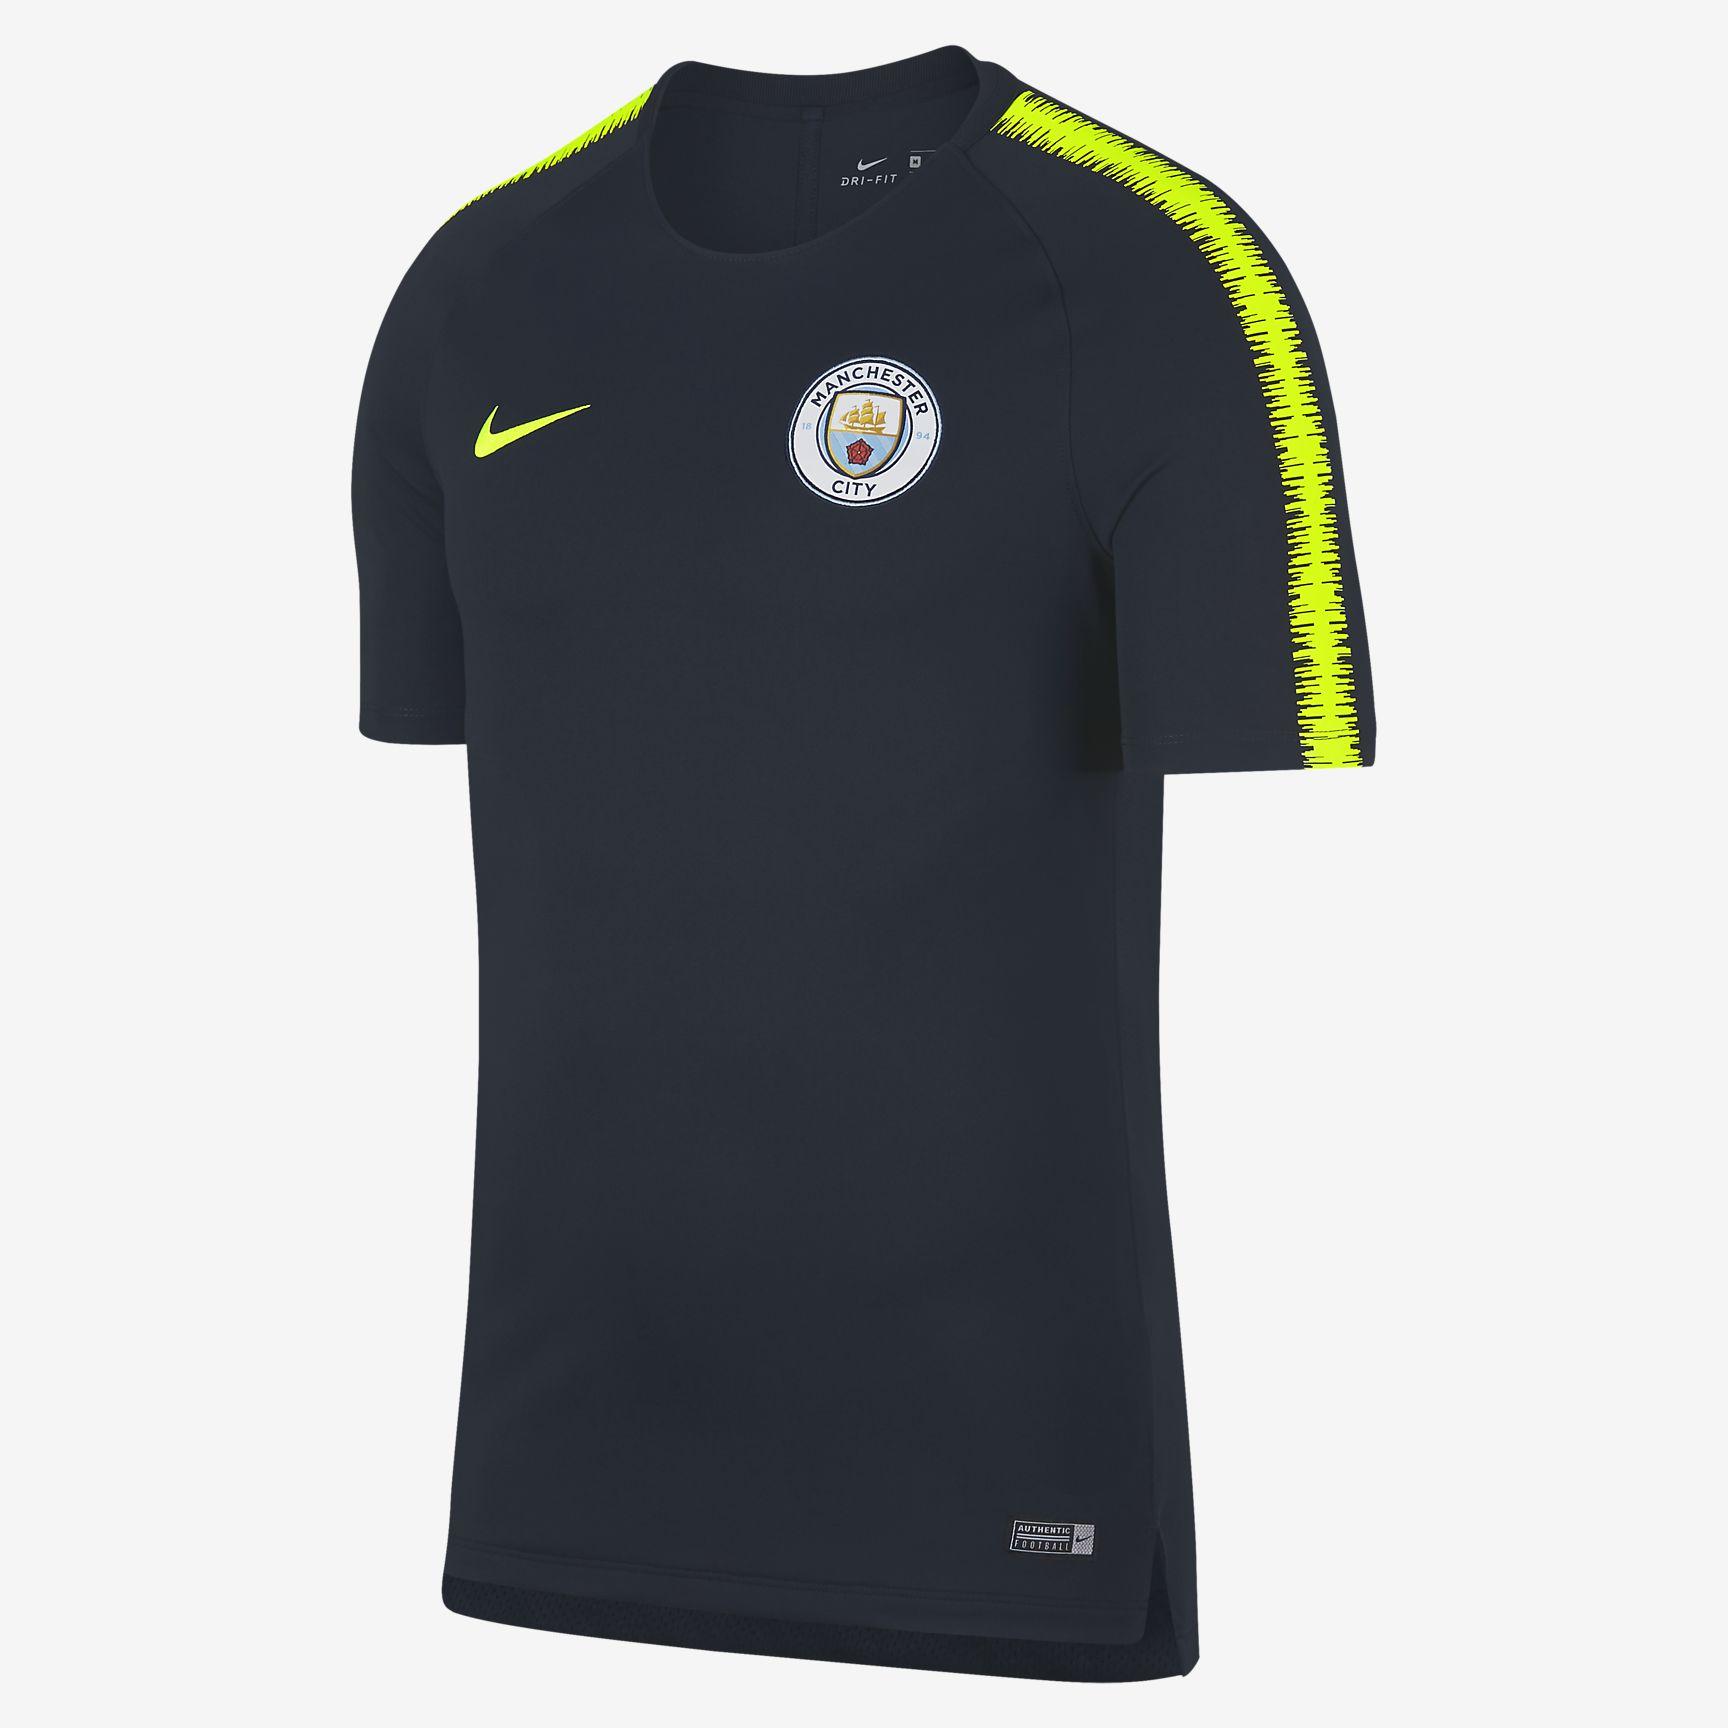 uk availability 7ce05 3b634 Nike Manchester City FC 2018-19 Breathe Squad Tee - Soccer Shop Manchester  City Merchandise - Superfanas.lt